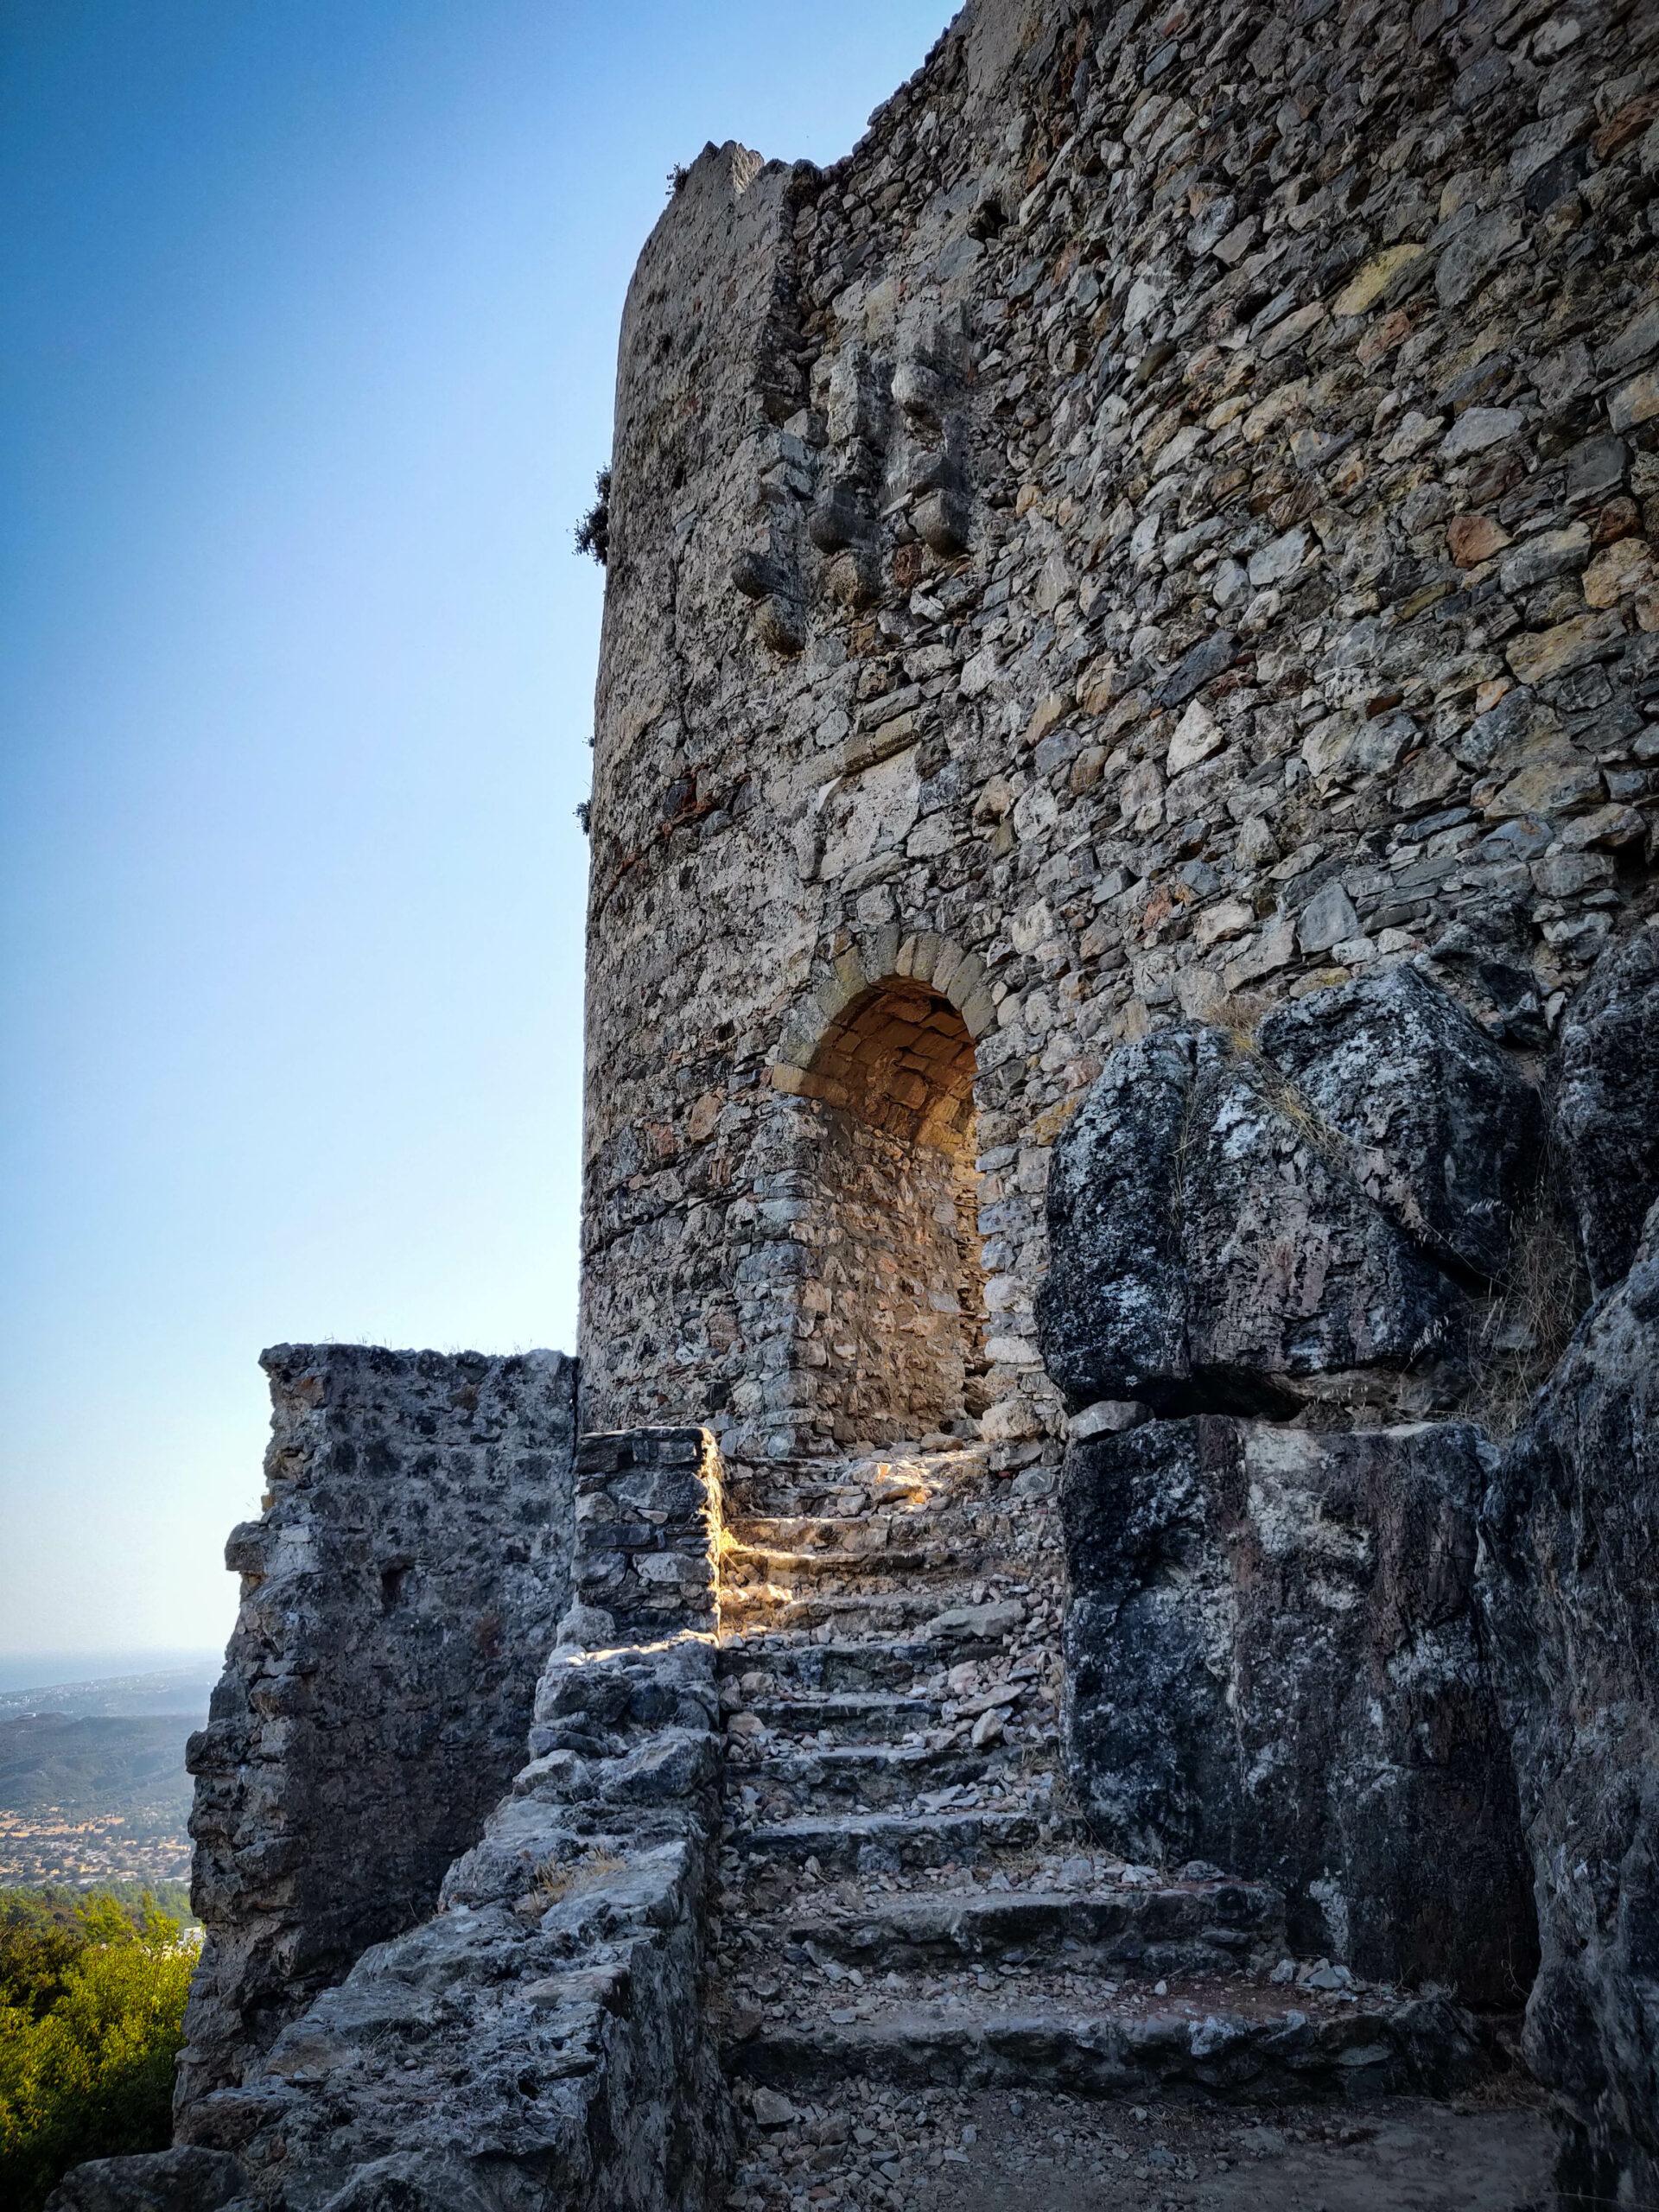 Climb the Knights Hospitaller's Castle of Asklipio in Rhodes